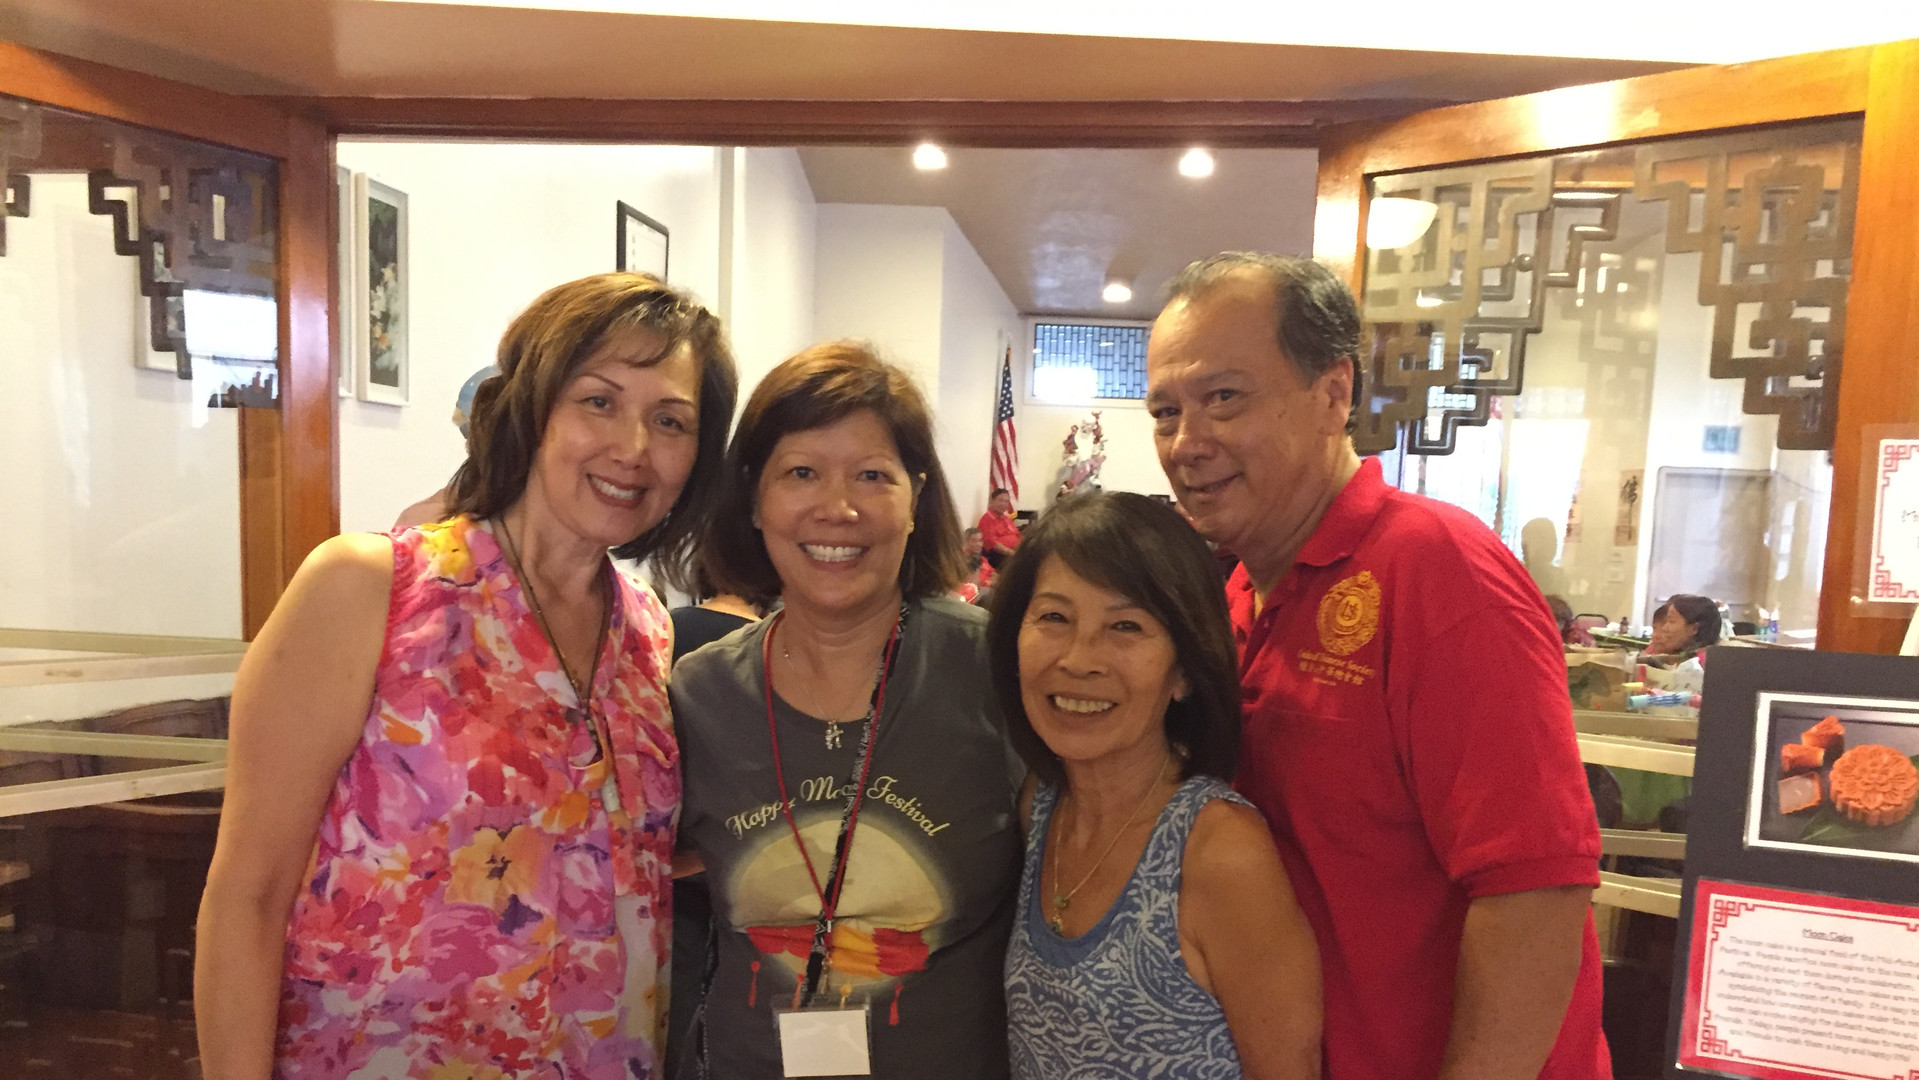 Volunteers Mona, Edna, Kenny, and Larry